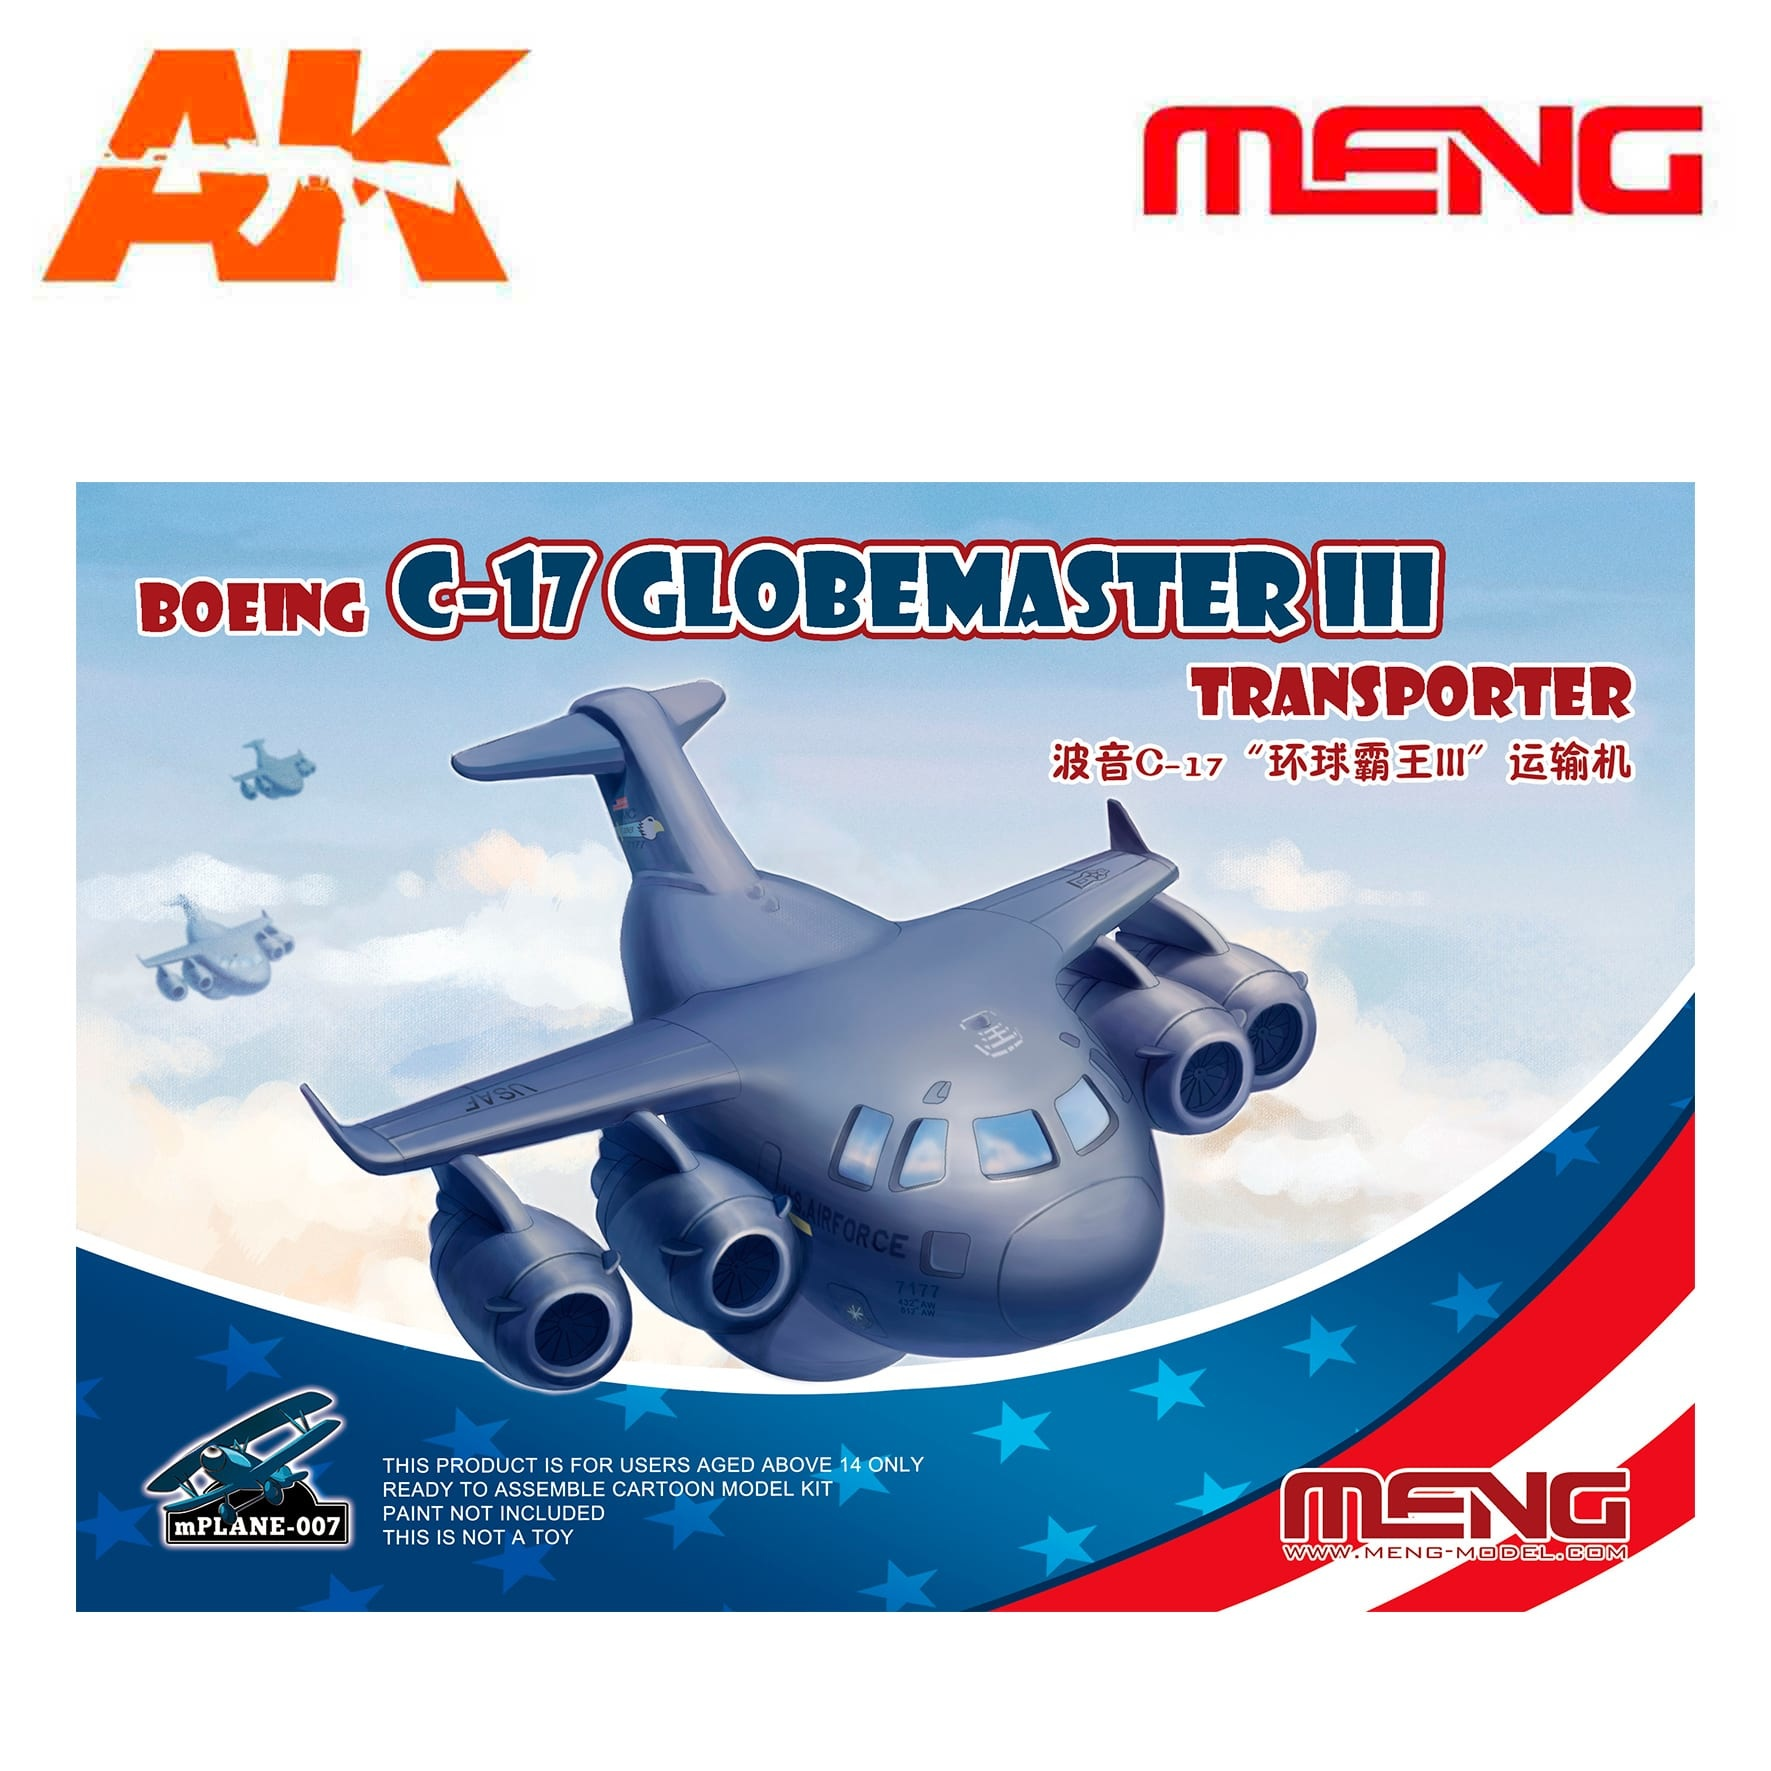 Meng Models Boeing C-17 Globemaster III Transporter - Cartoon Model - Meng Models - MM Mplane-007